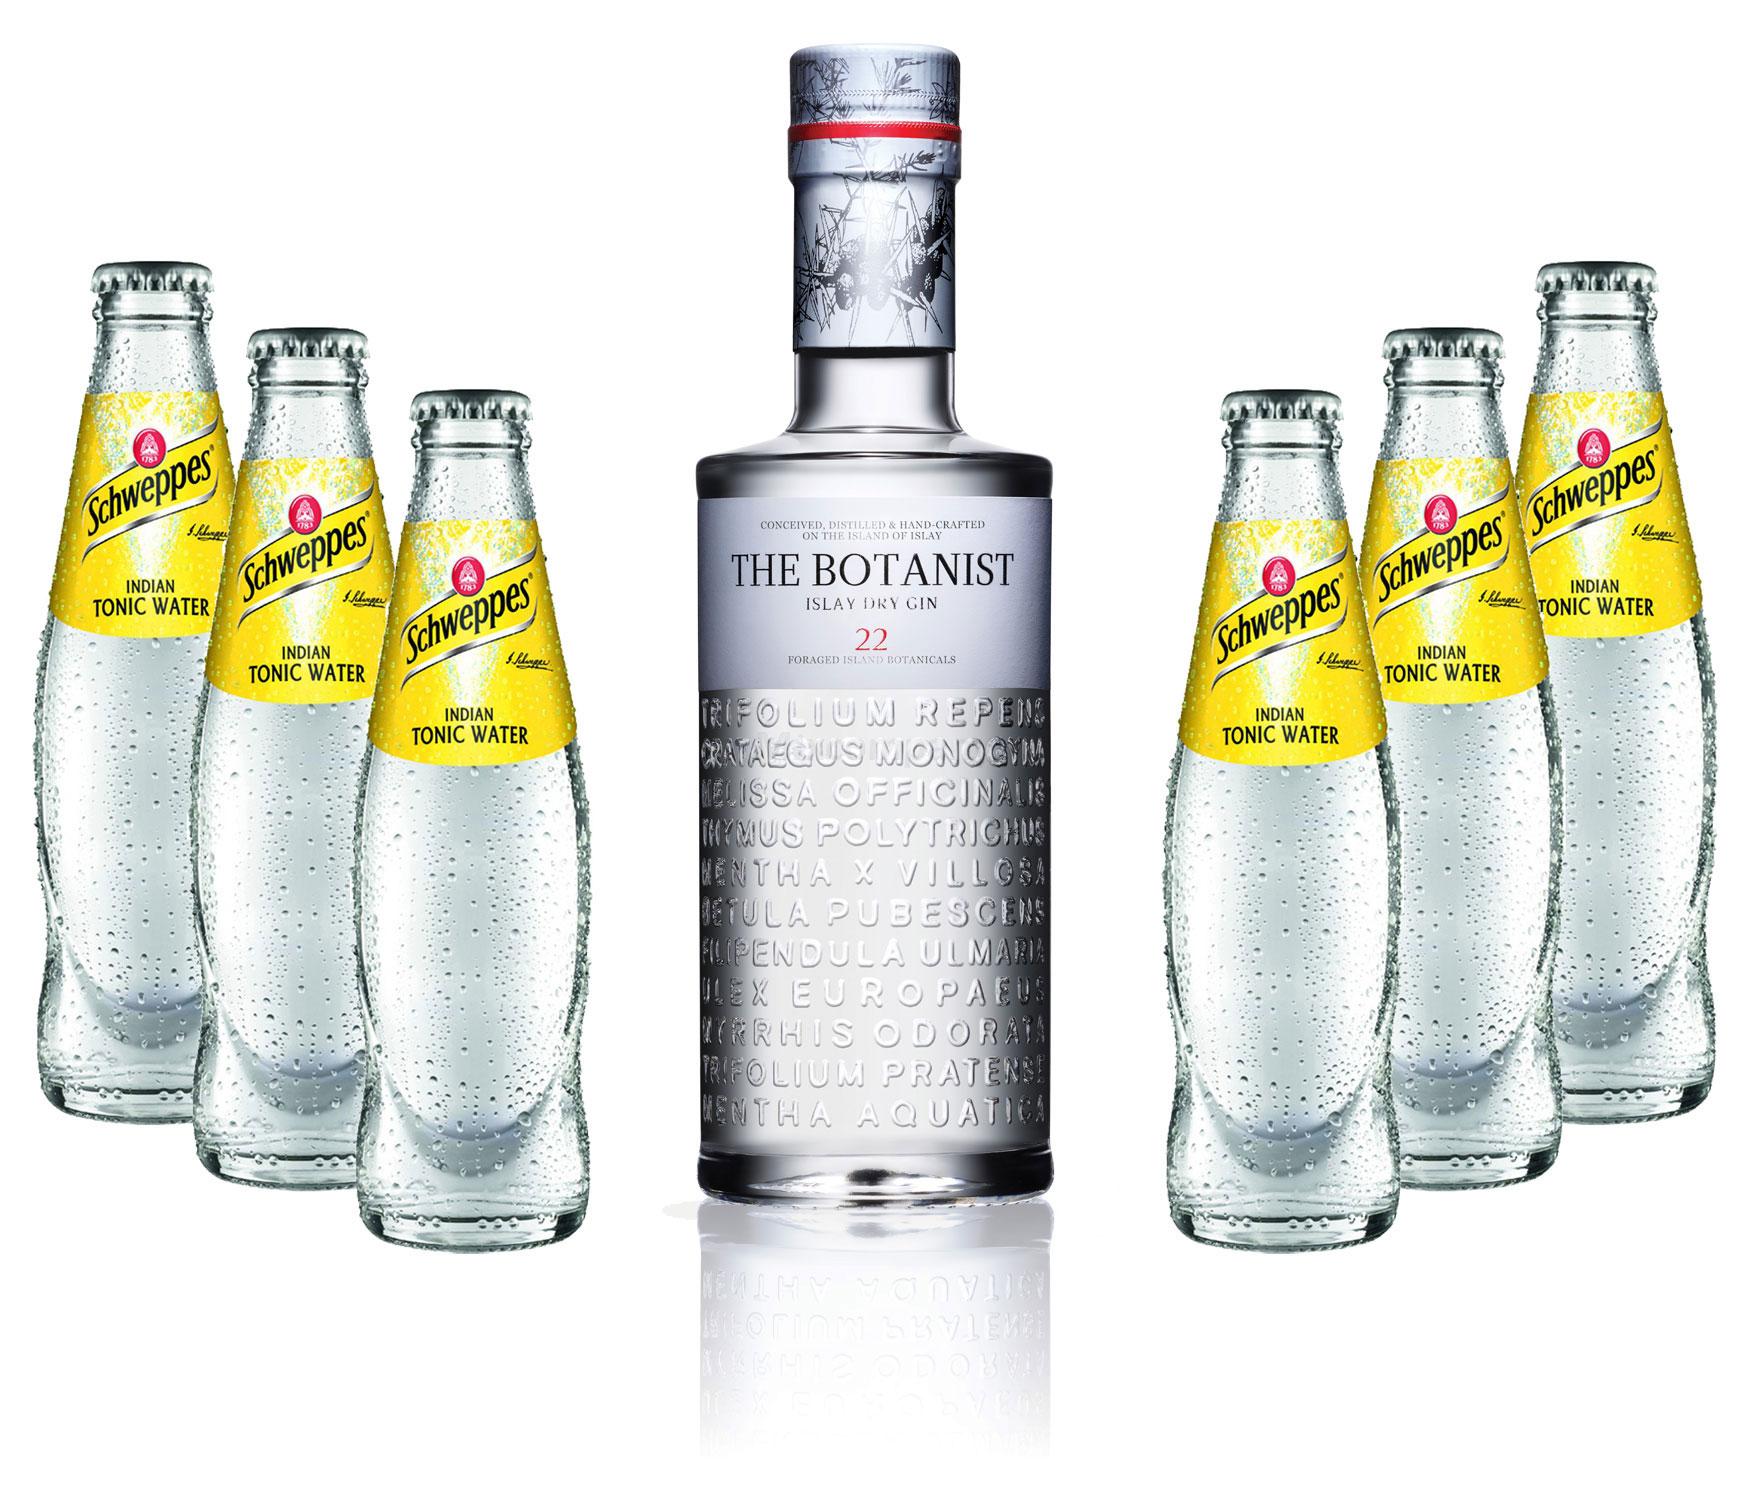 Gin Tonic Set - The Botanist Islay Dry Gin 0,7l 700ml (46% Vol) + 6x Schweppes Tonic Water 200ml inkl. Pfand MEHRWEG